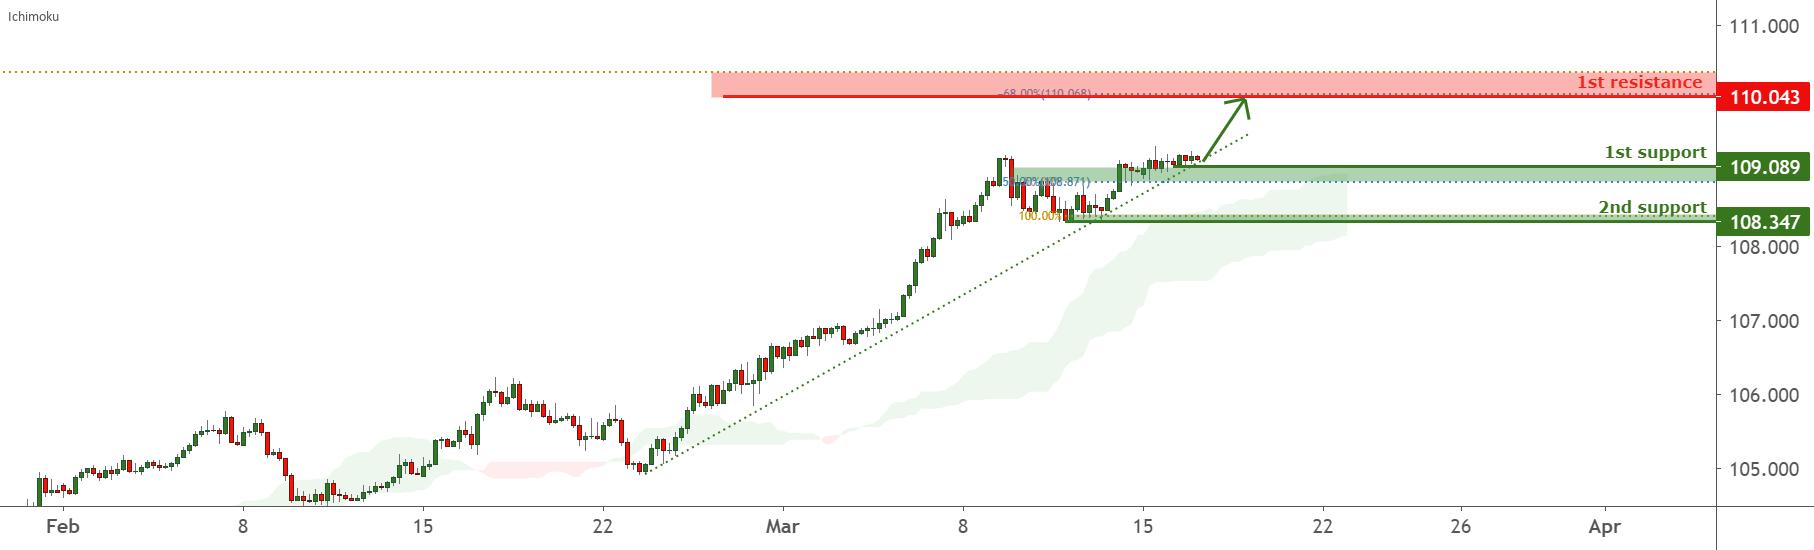 USDJPY is facing bullish pressure, potential for more upside for FX:USDJPY by FXCM